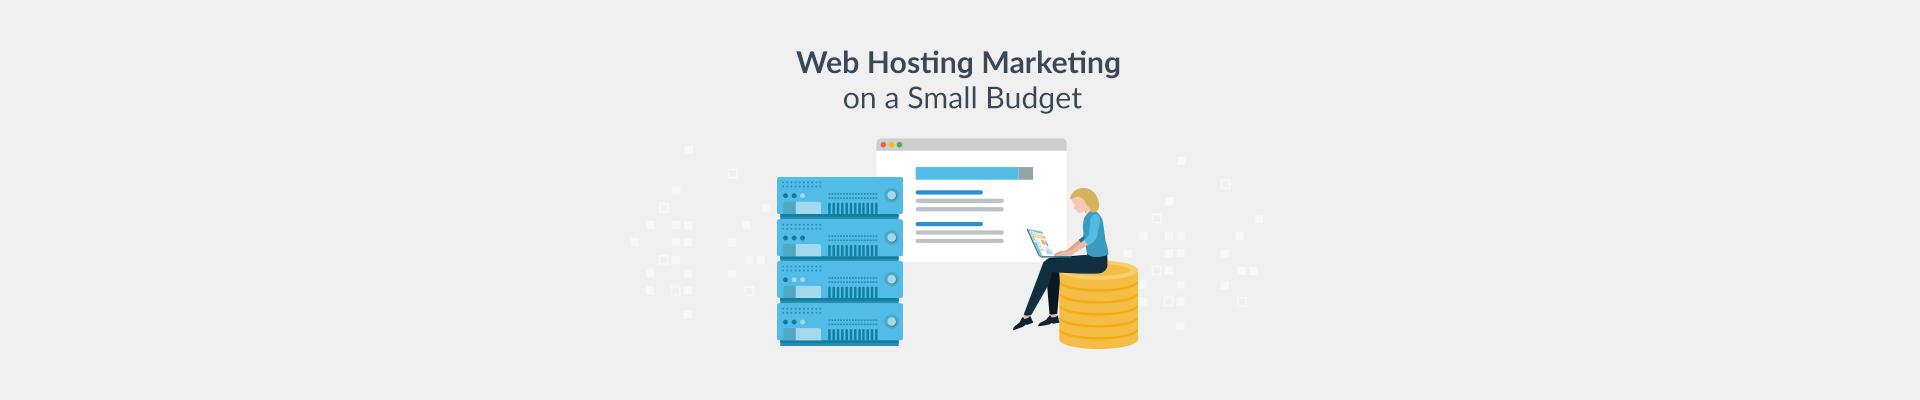 Web Hosting Marketing